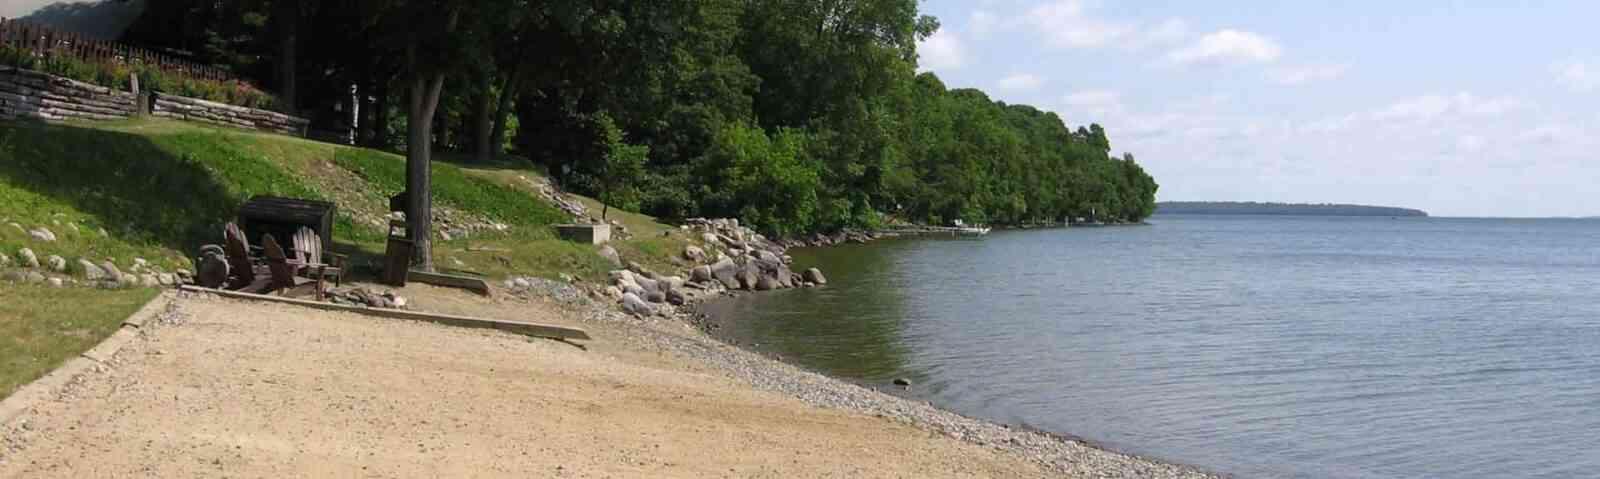 Relax on the sandy beaches of Adventure North Resort on Leech Lake